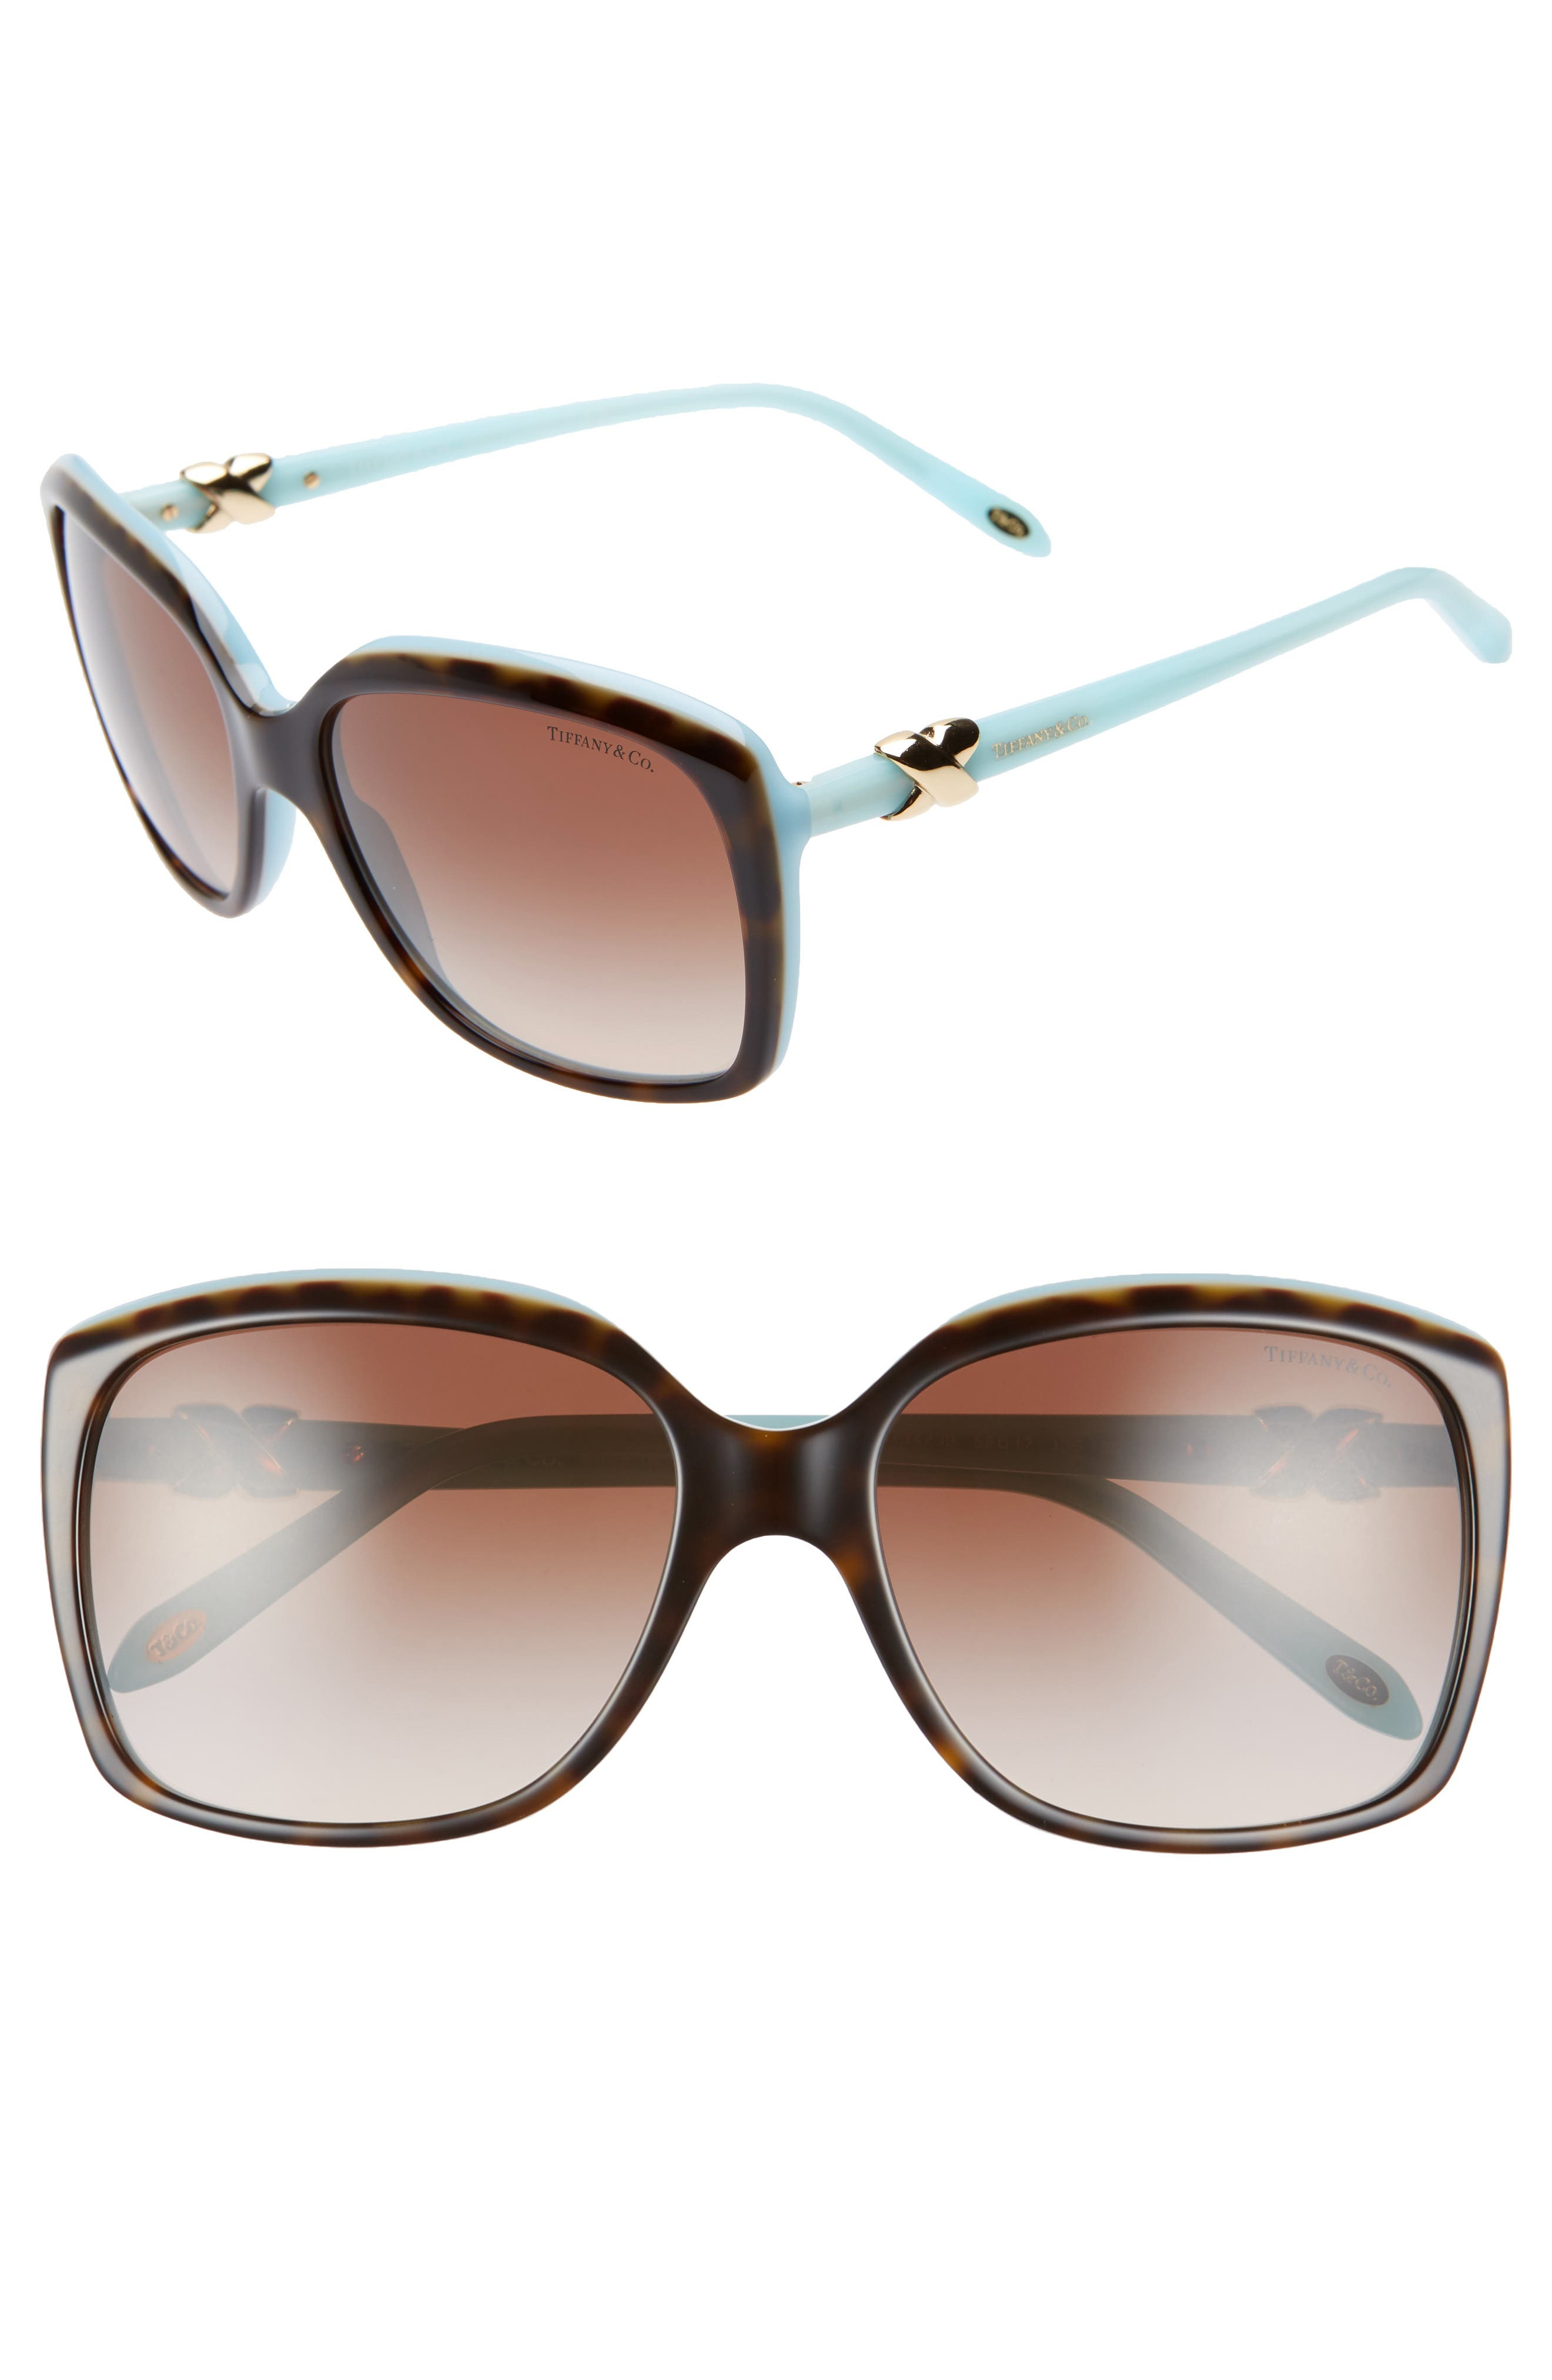 3e762e75abd74 Women s Tiffany   Co. 58Mm Rectangular Sunglasses -